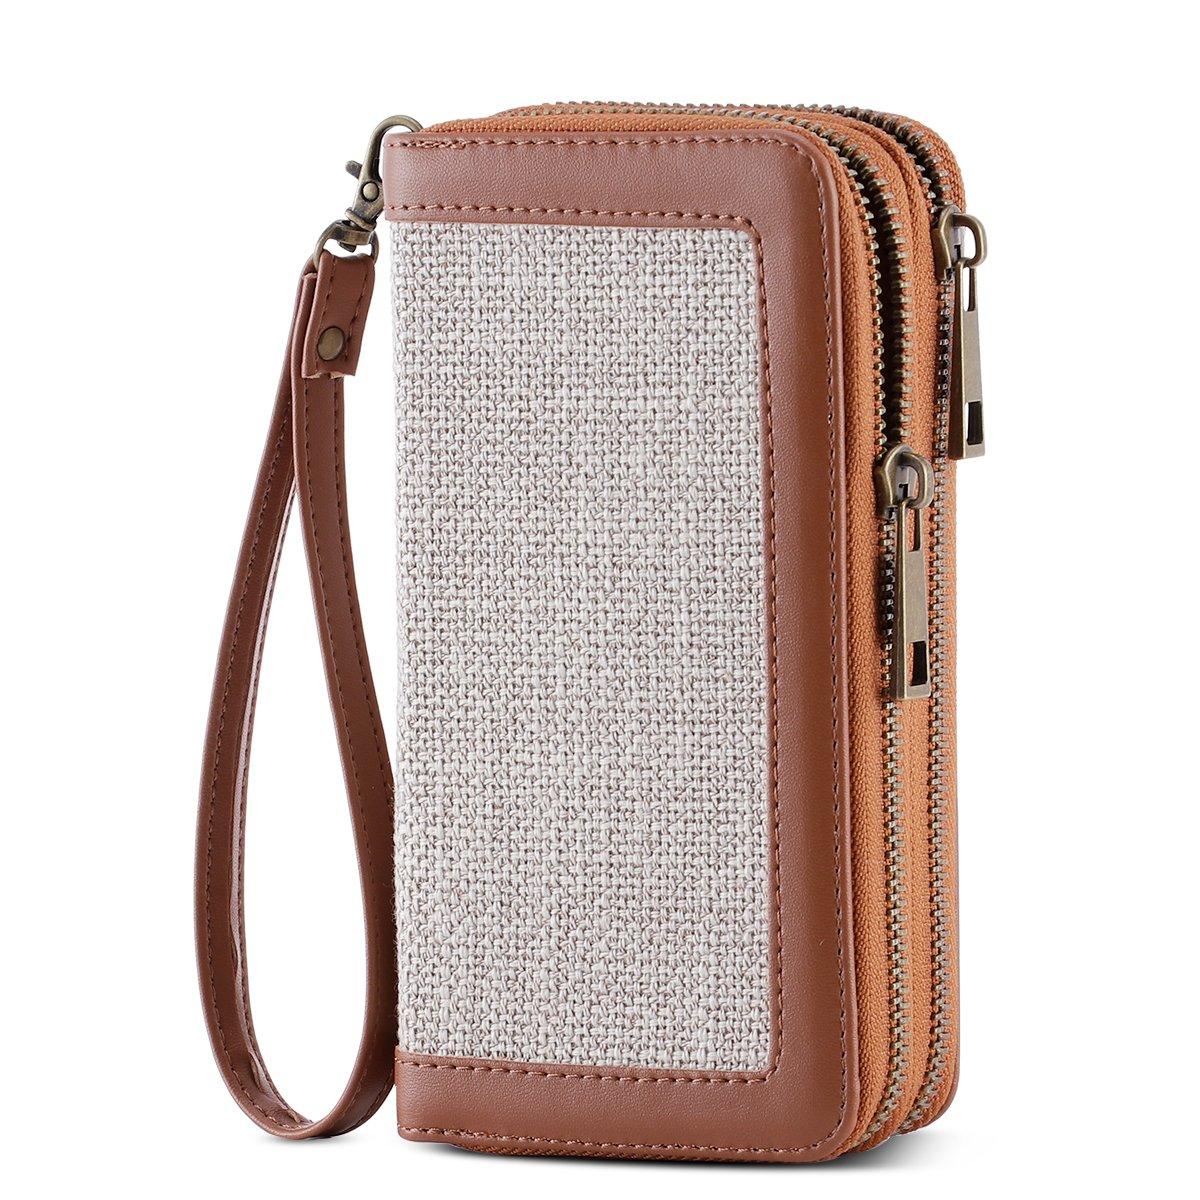 HAWEE Cellphone Wallet Wristlet Leather